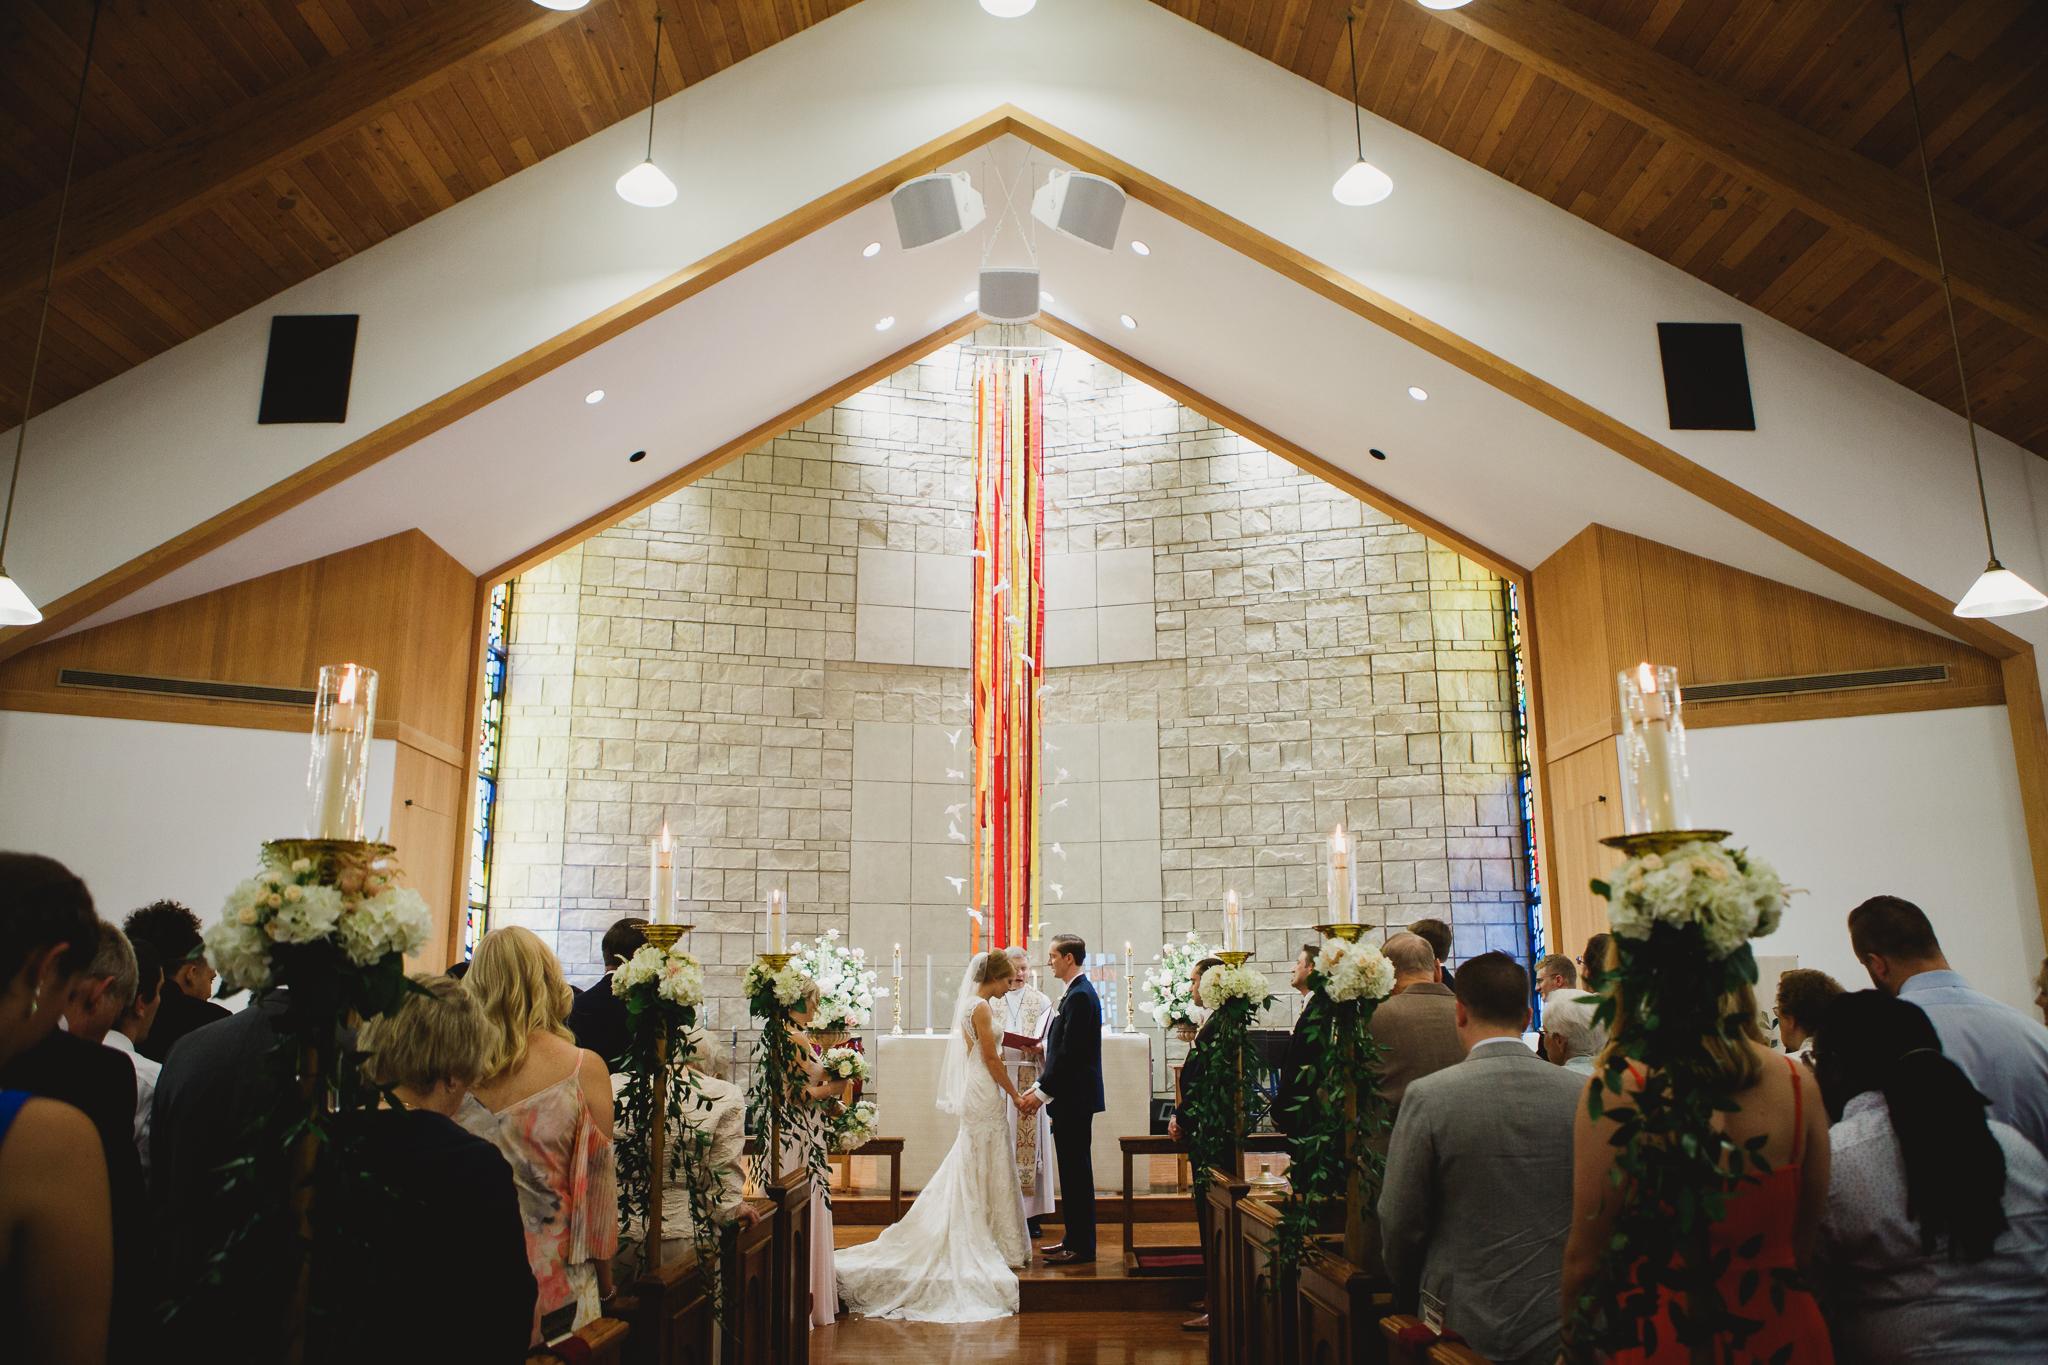 Michael and Kelly - the ashton depot - wedding DFW - wedding photographer- elizalde photography (52 of 150).jpg